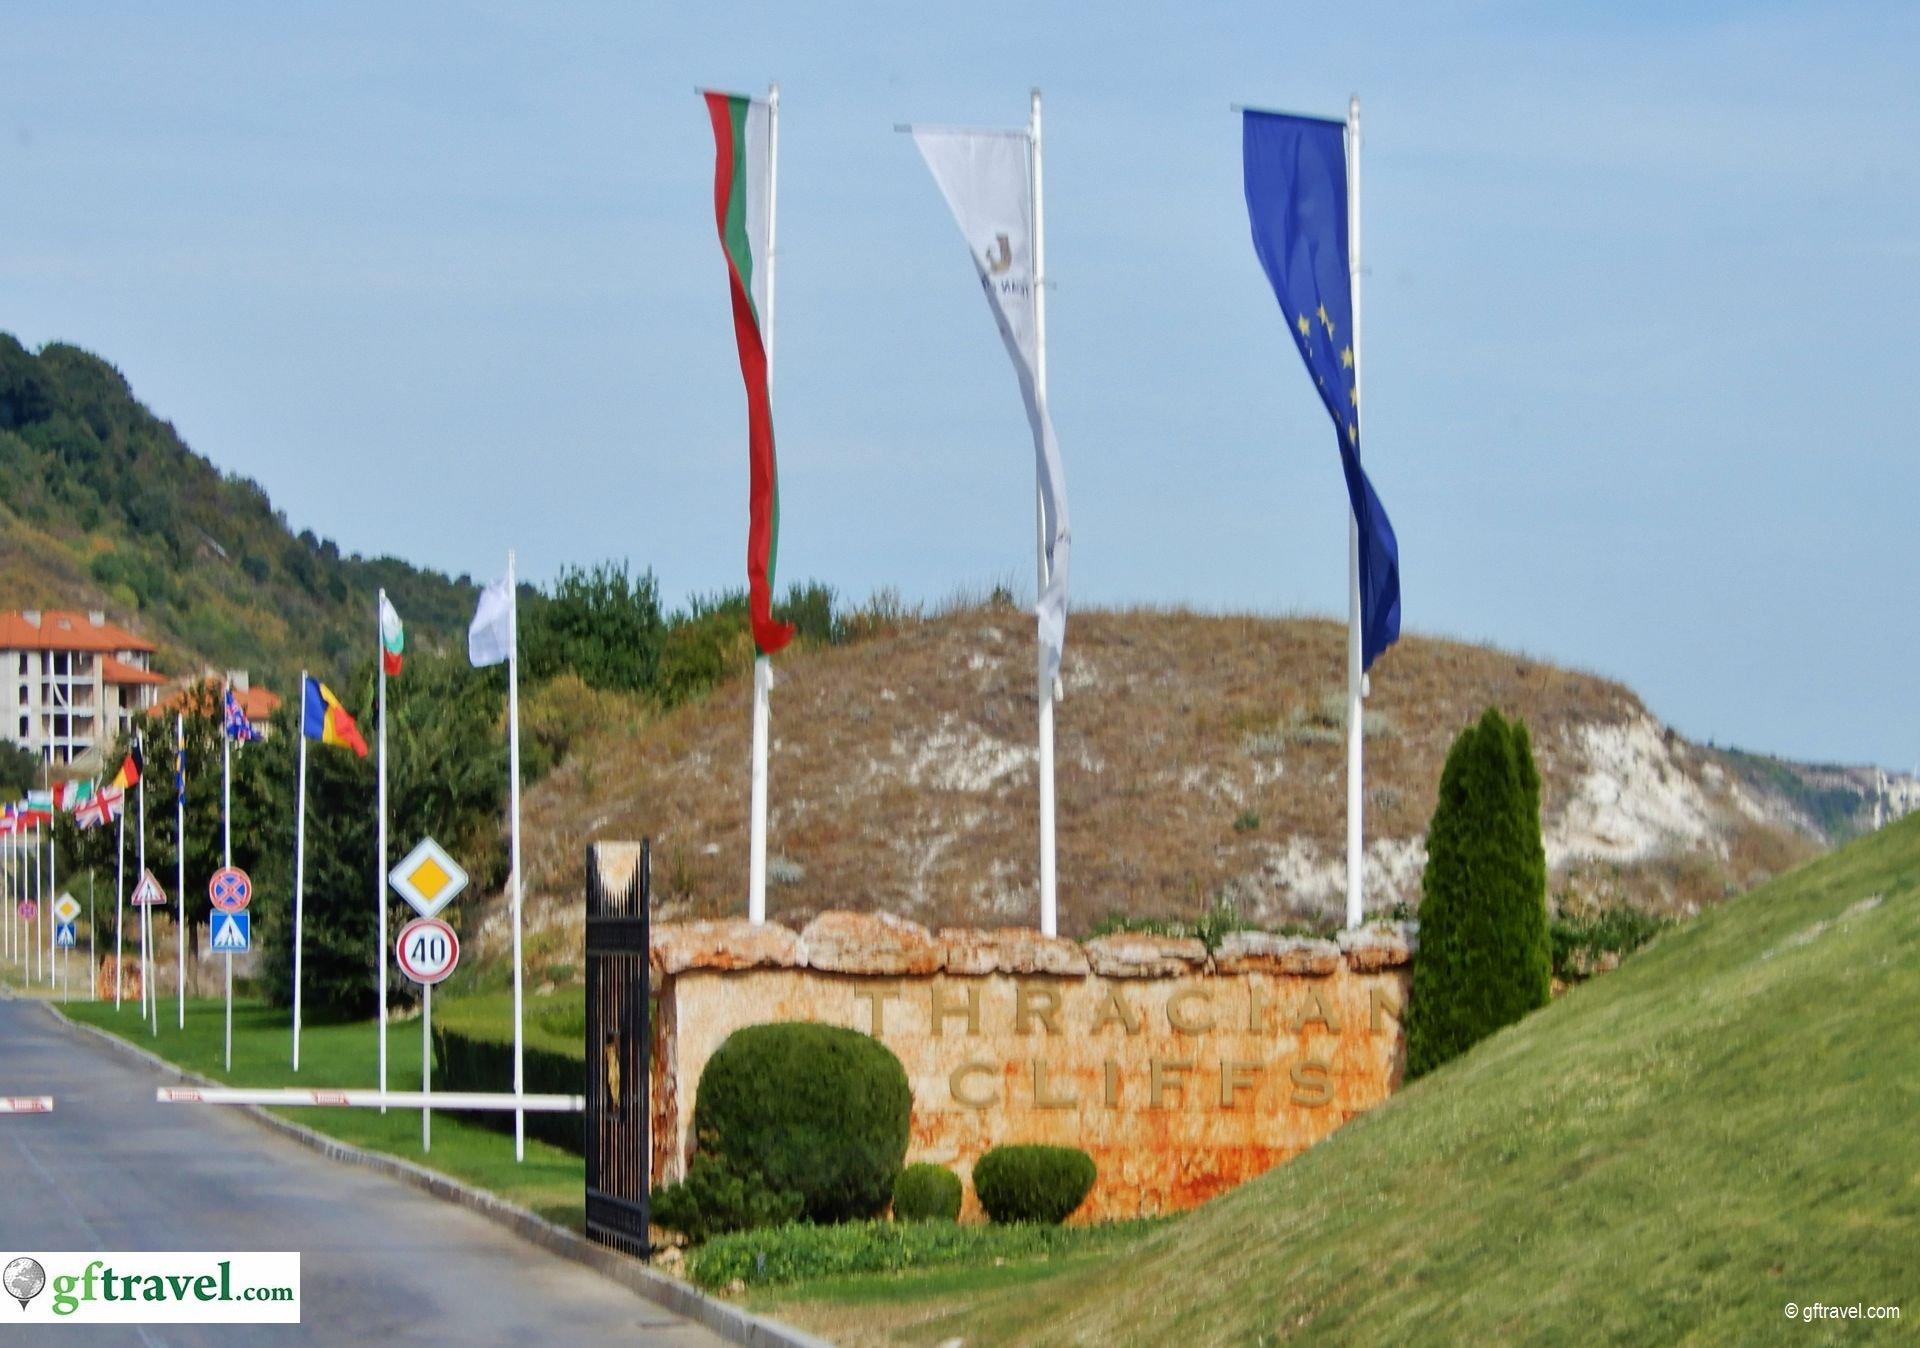 Golf-Gruppenreise-Thracian-Cliffs-Reisebericht-Einfahrt-Resort